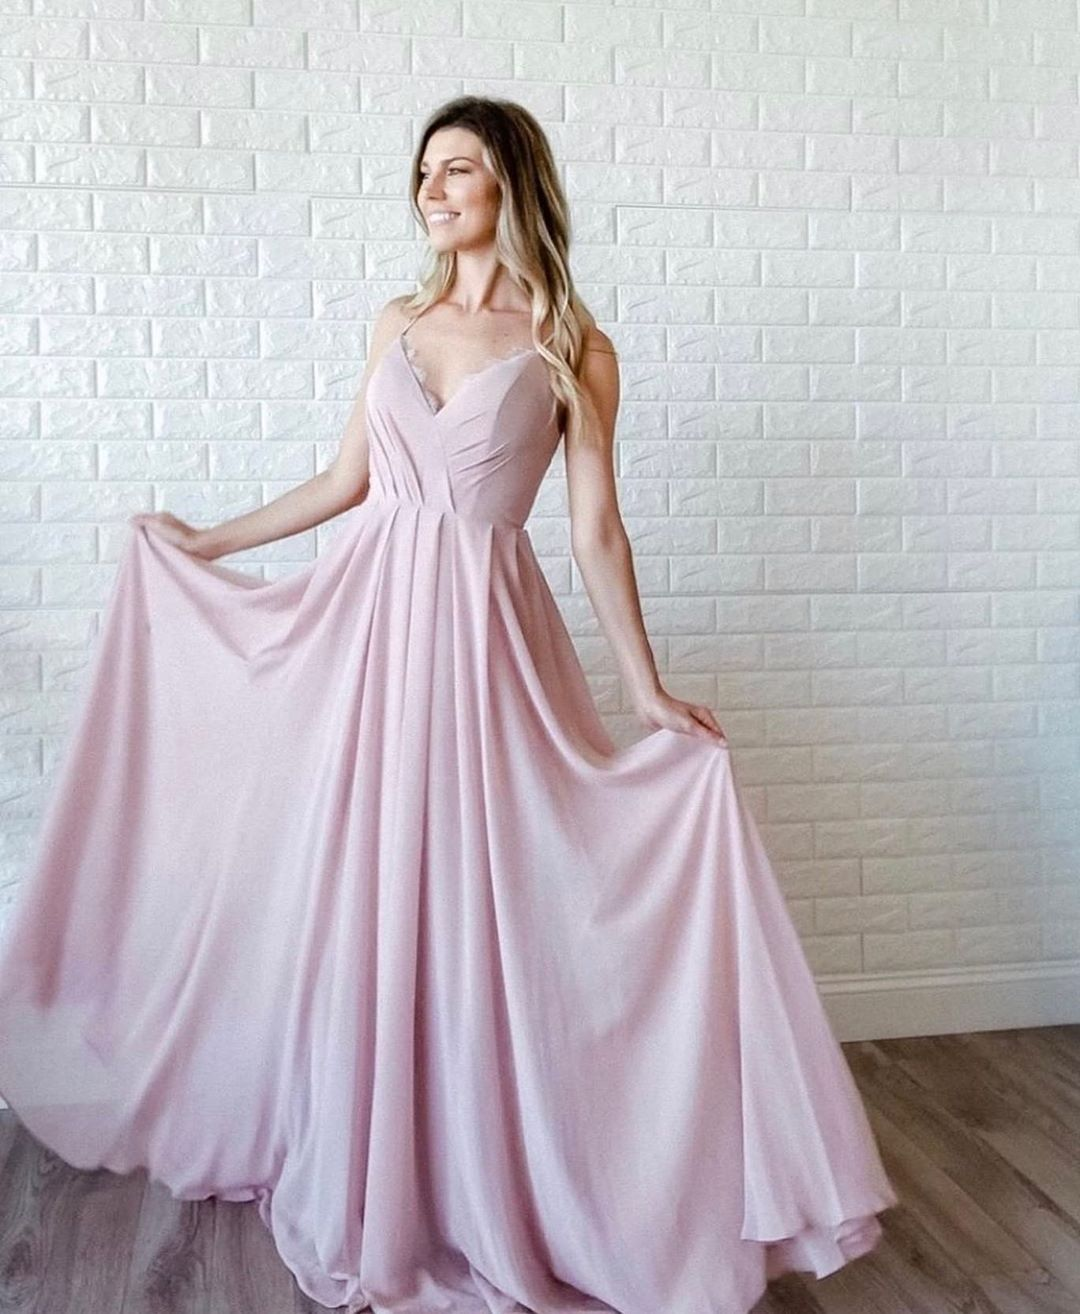 Nude Pink Sweetheart Neckline Long Chiffon Mermaid